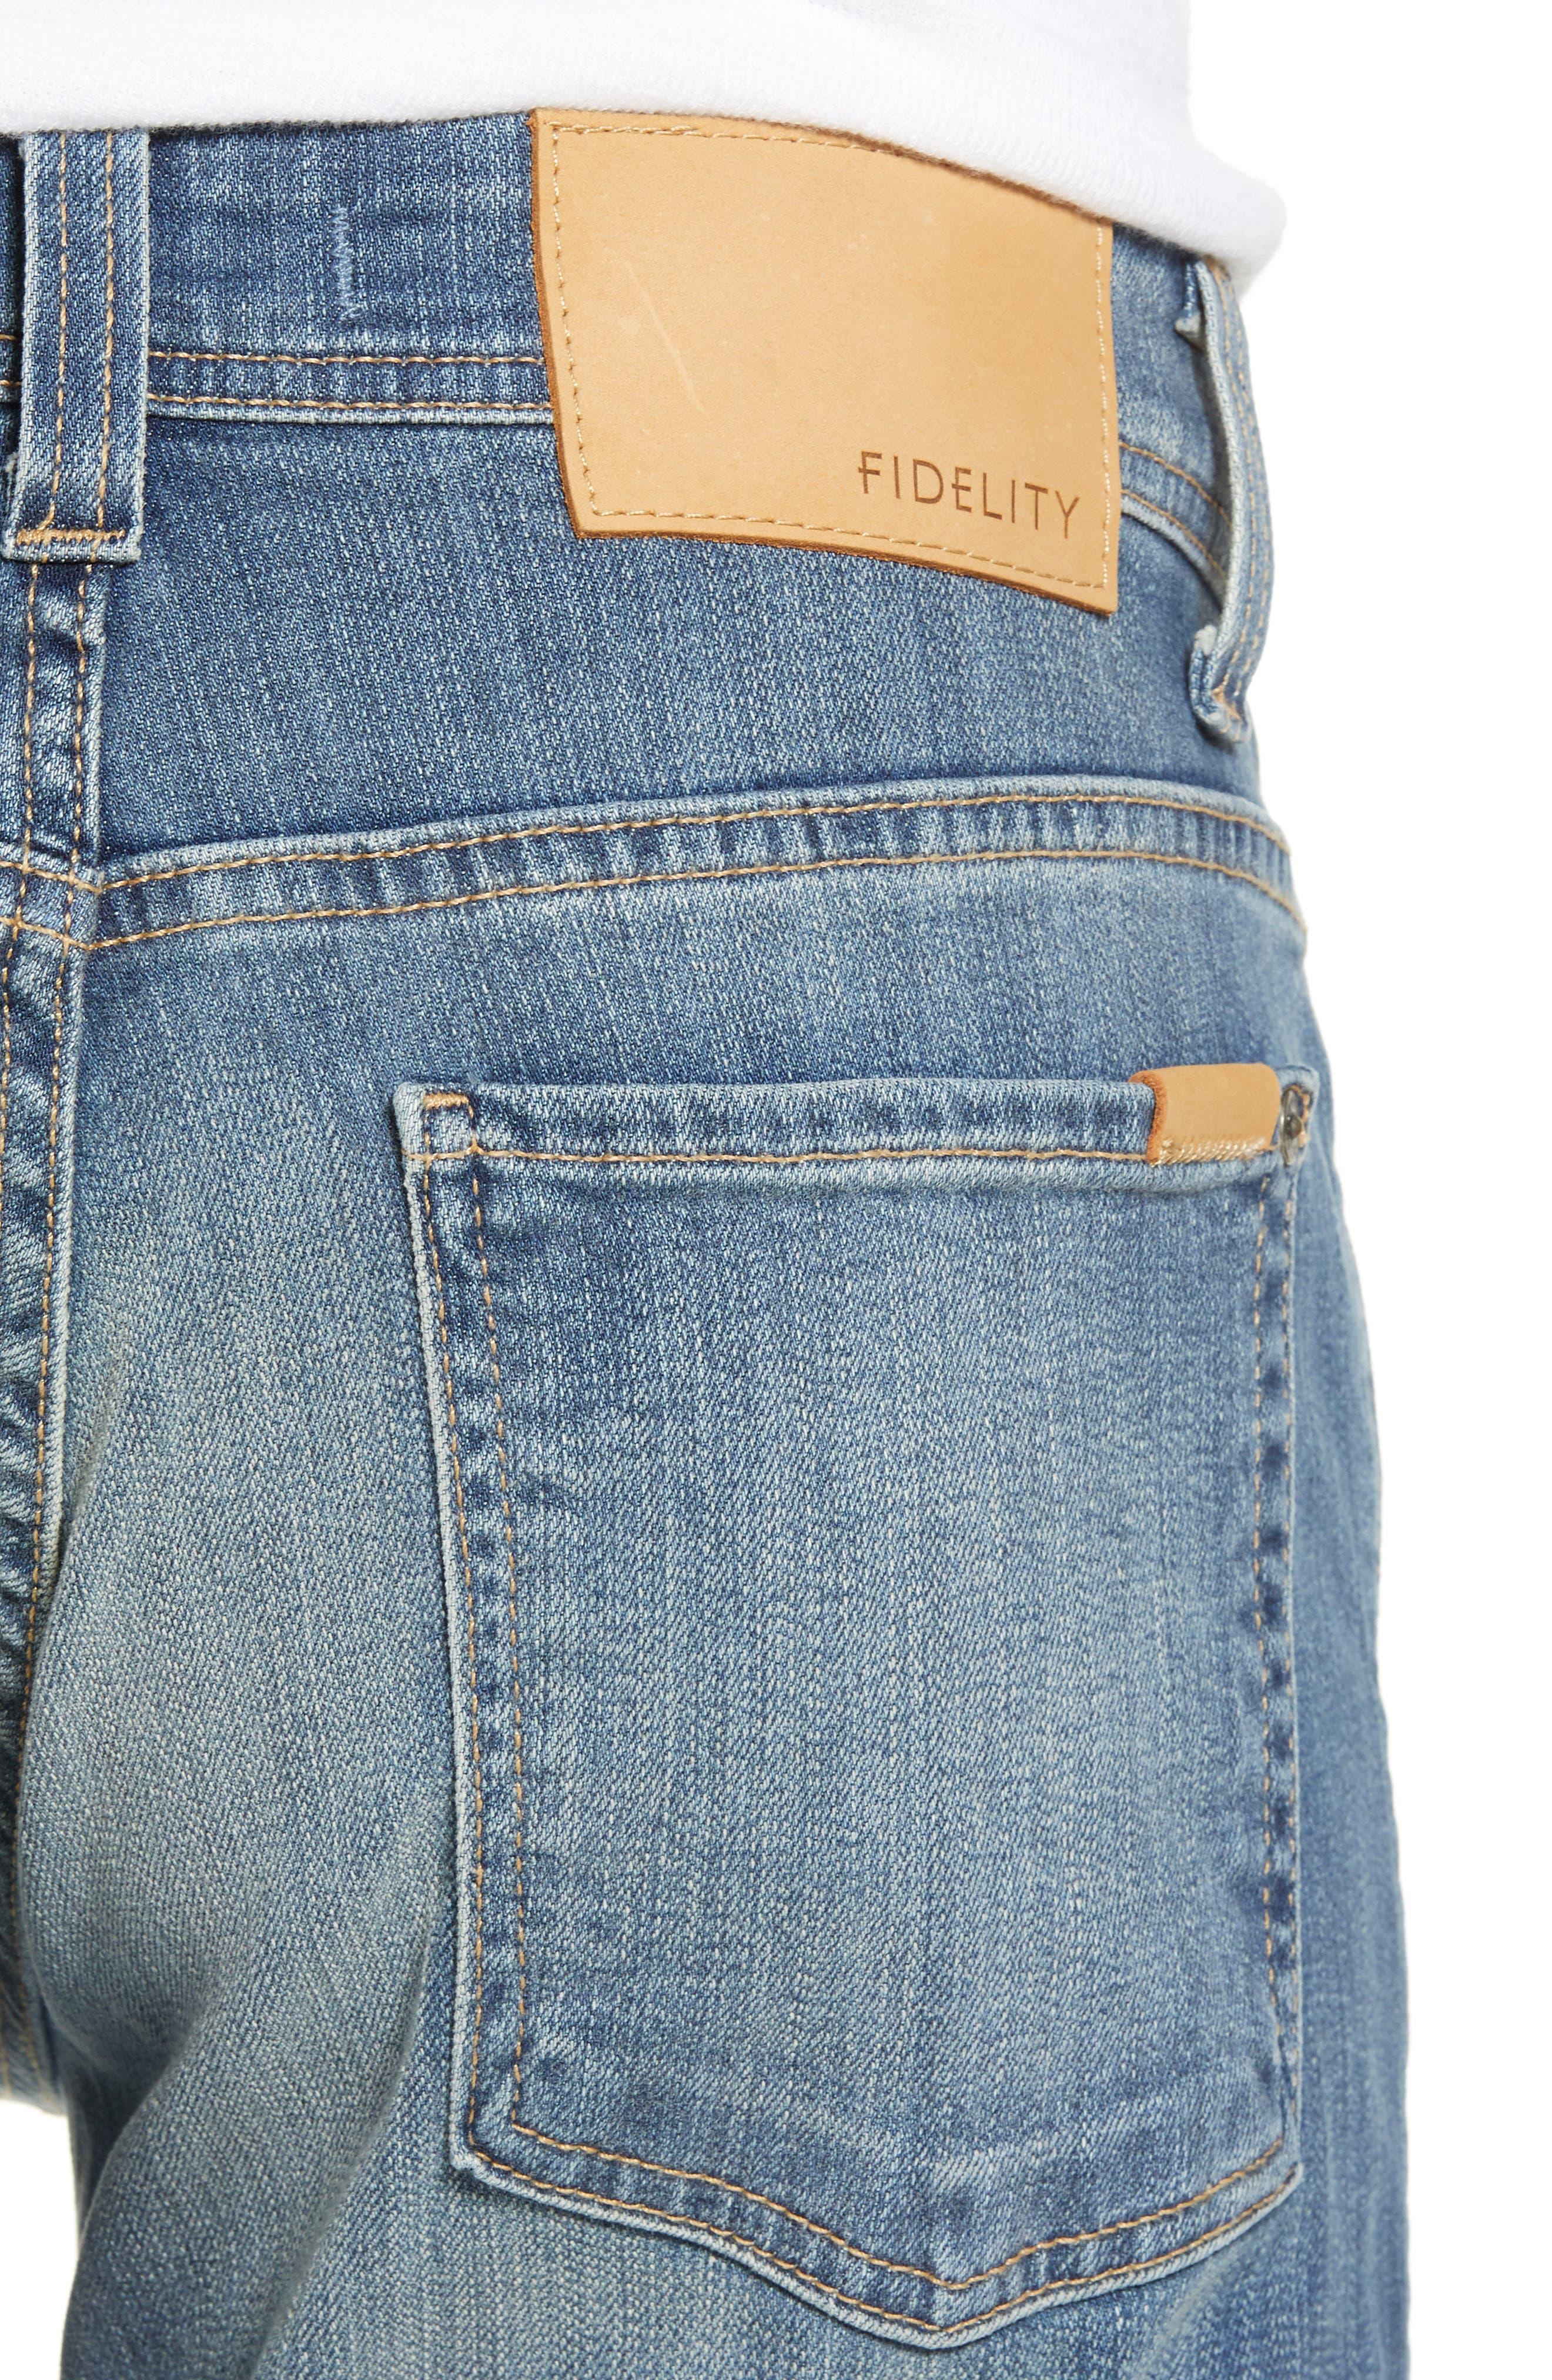 Jimmy Slim Straight Leg Jeans,                             Alternate thumbnail 4, color,                             SYNDICATE BLUE